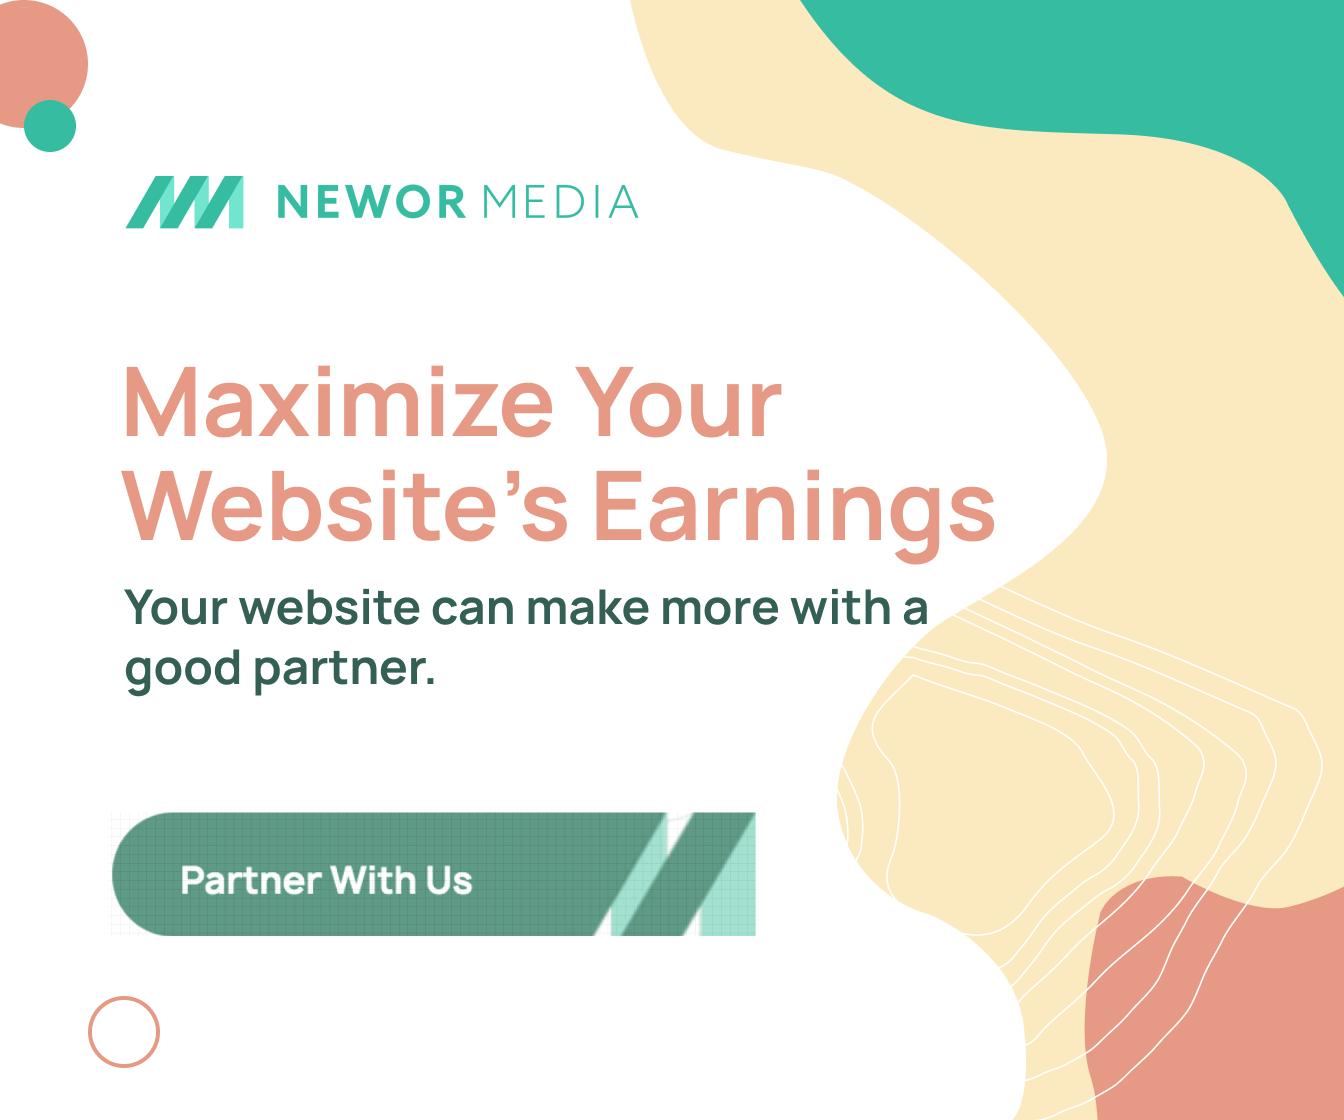 Newor Media Display Ad